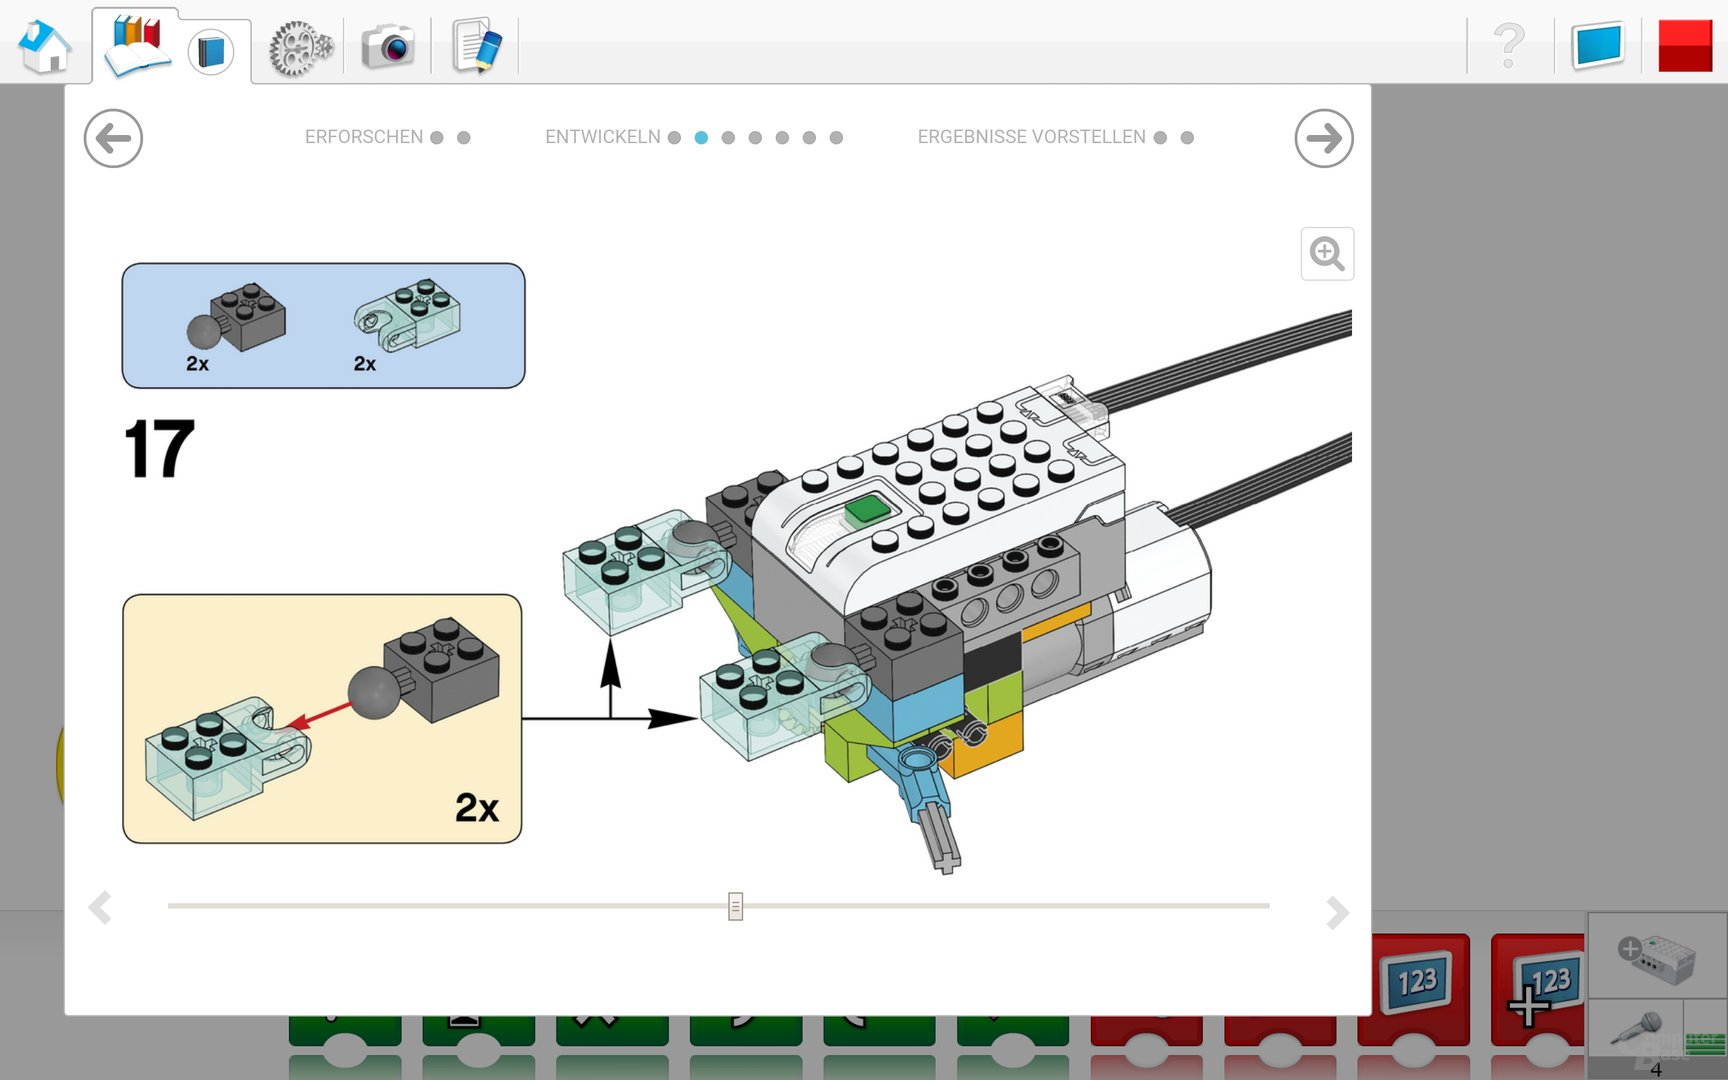 Lego WeDo 2.0 Android App – Virtuelle Bauanleitung